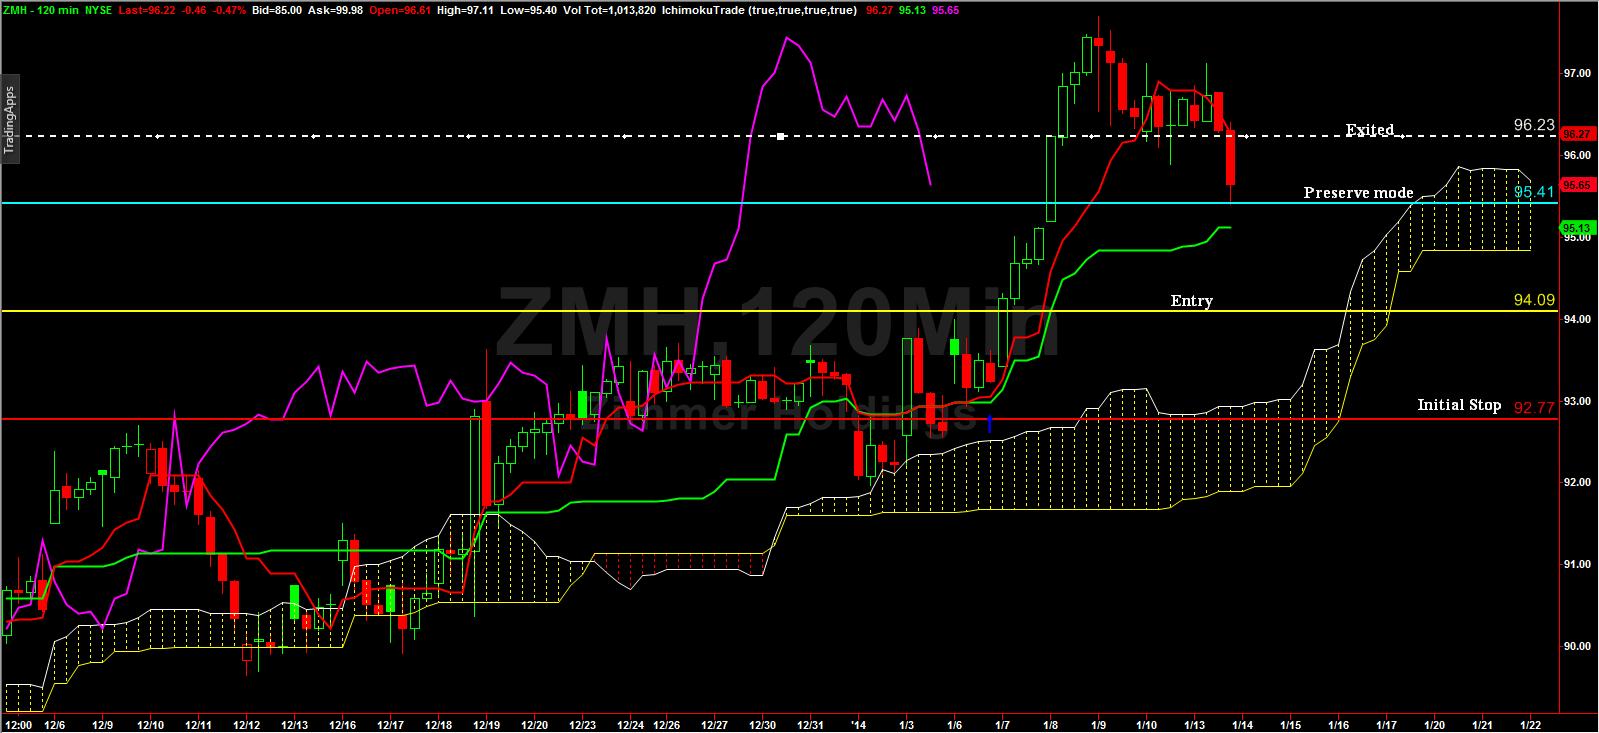 Weekly_stock_jan10_2014_chart